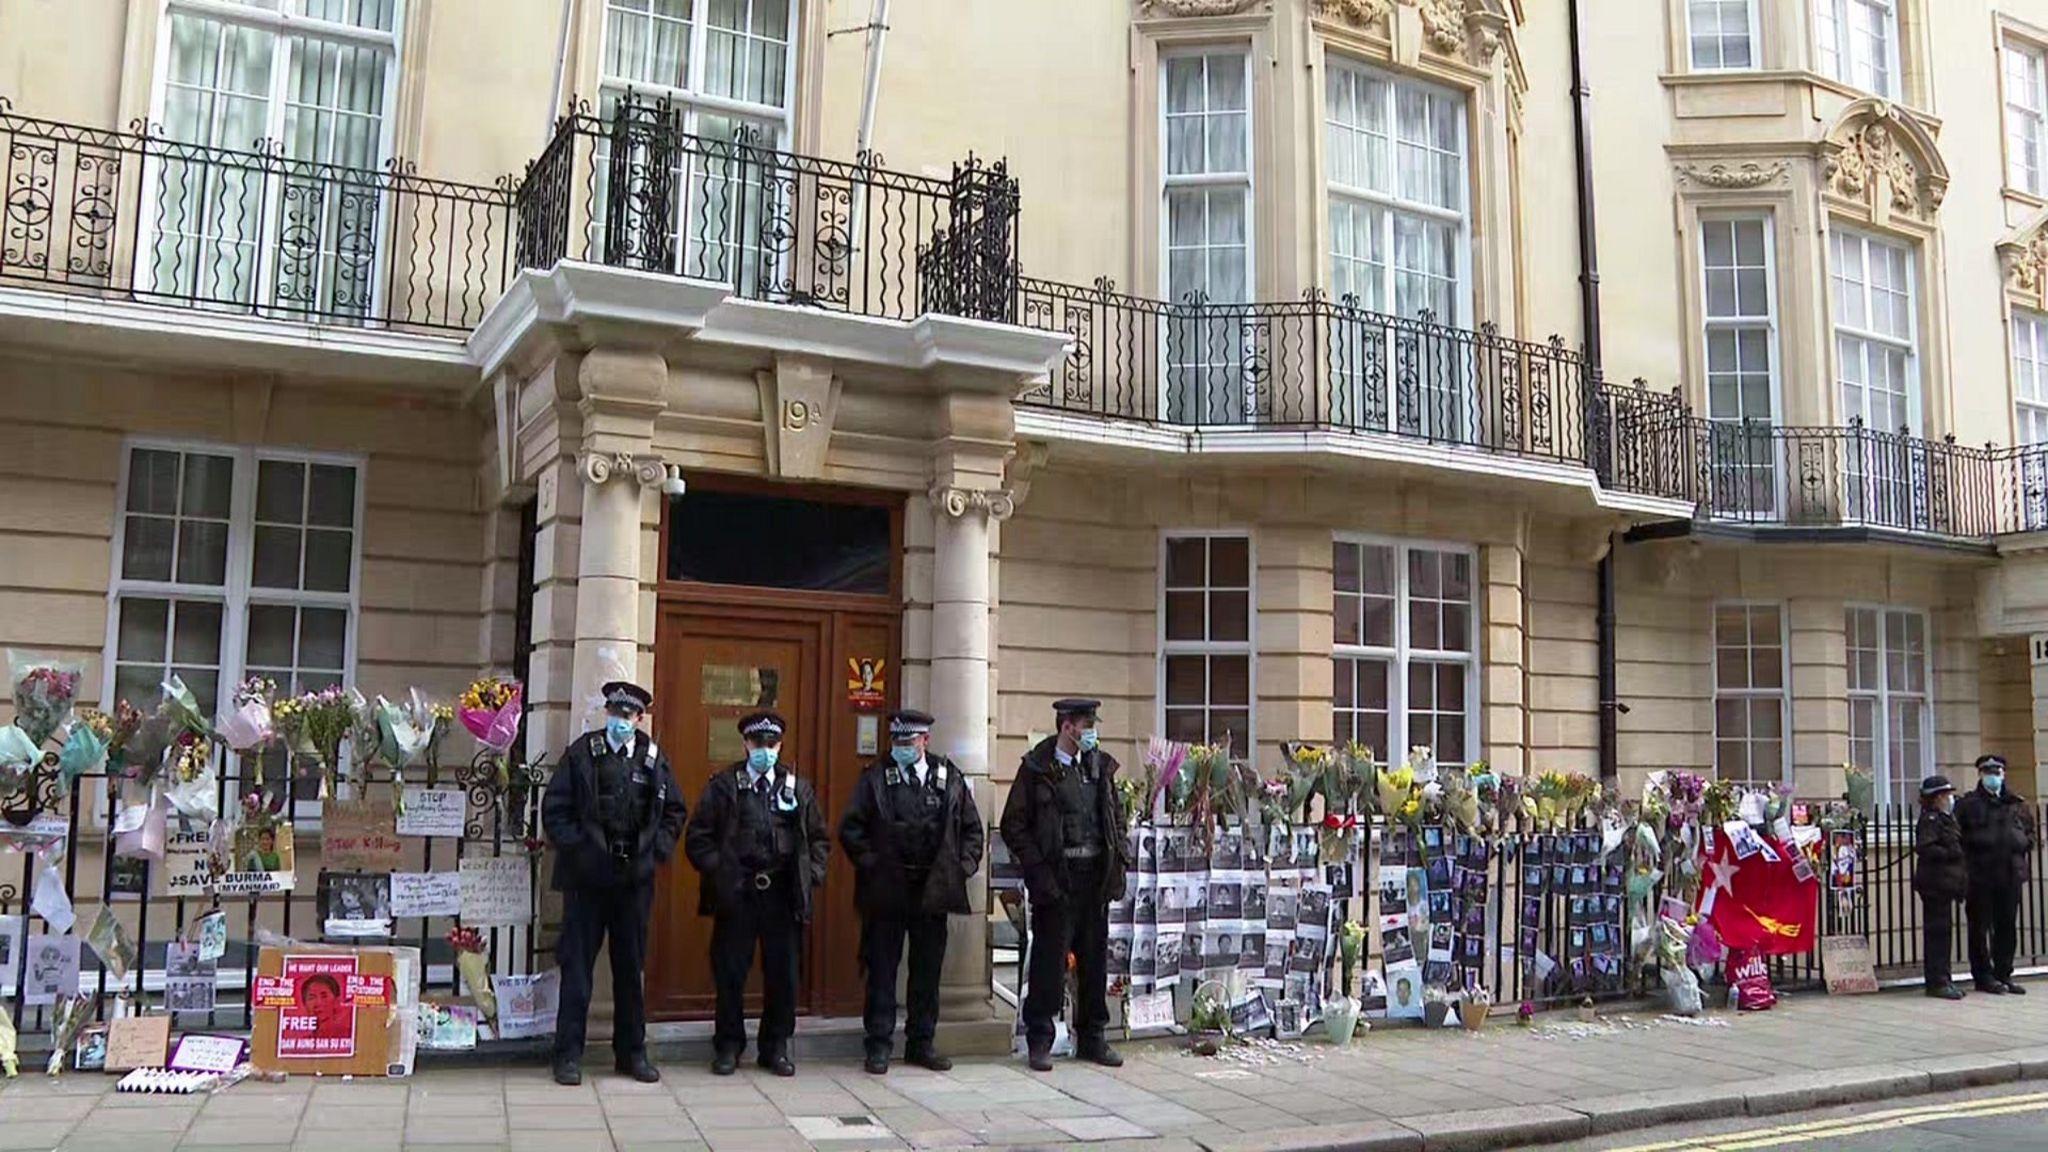 UK Police standing outside Myanmar embassy